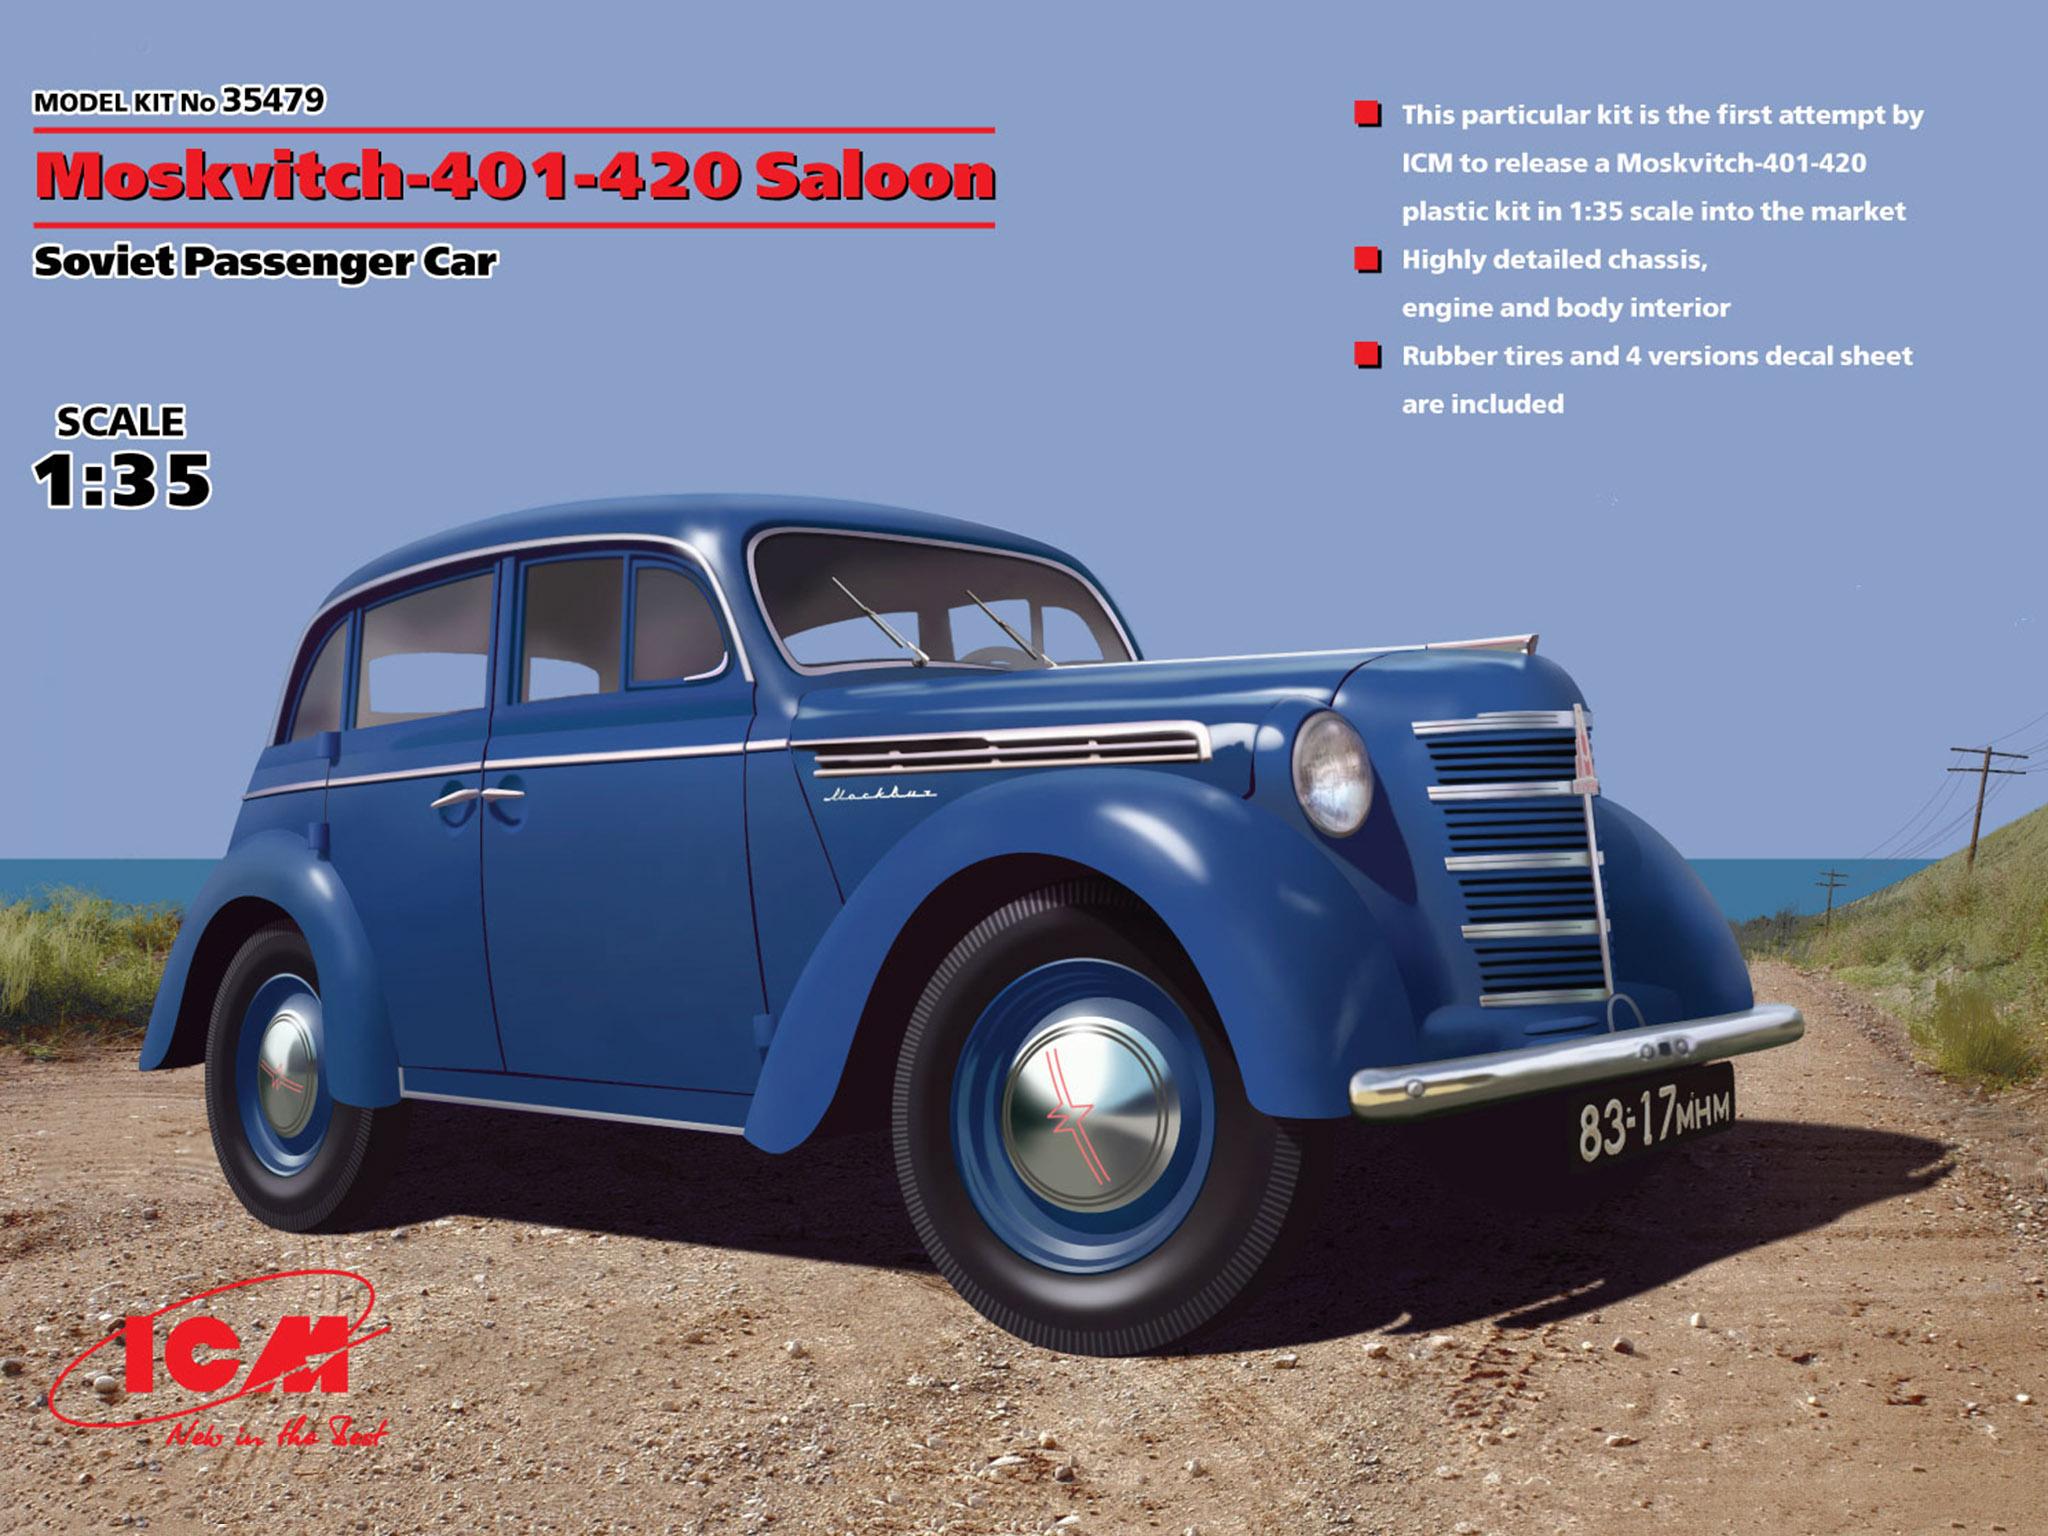 35479_Moskvitch-401-420 Saloon, Soviet Passenger Car_eng (6)